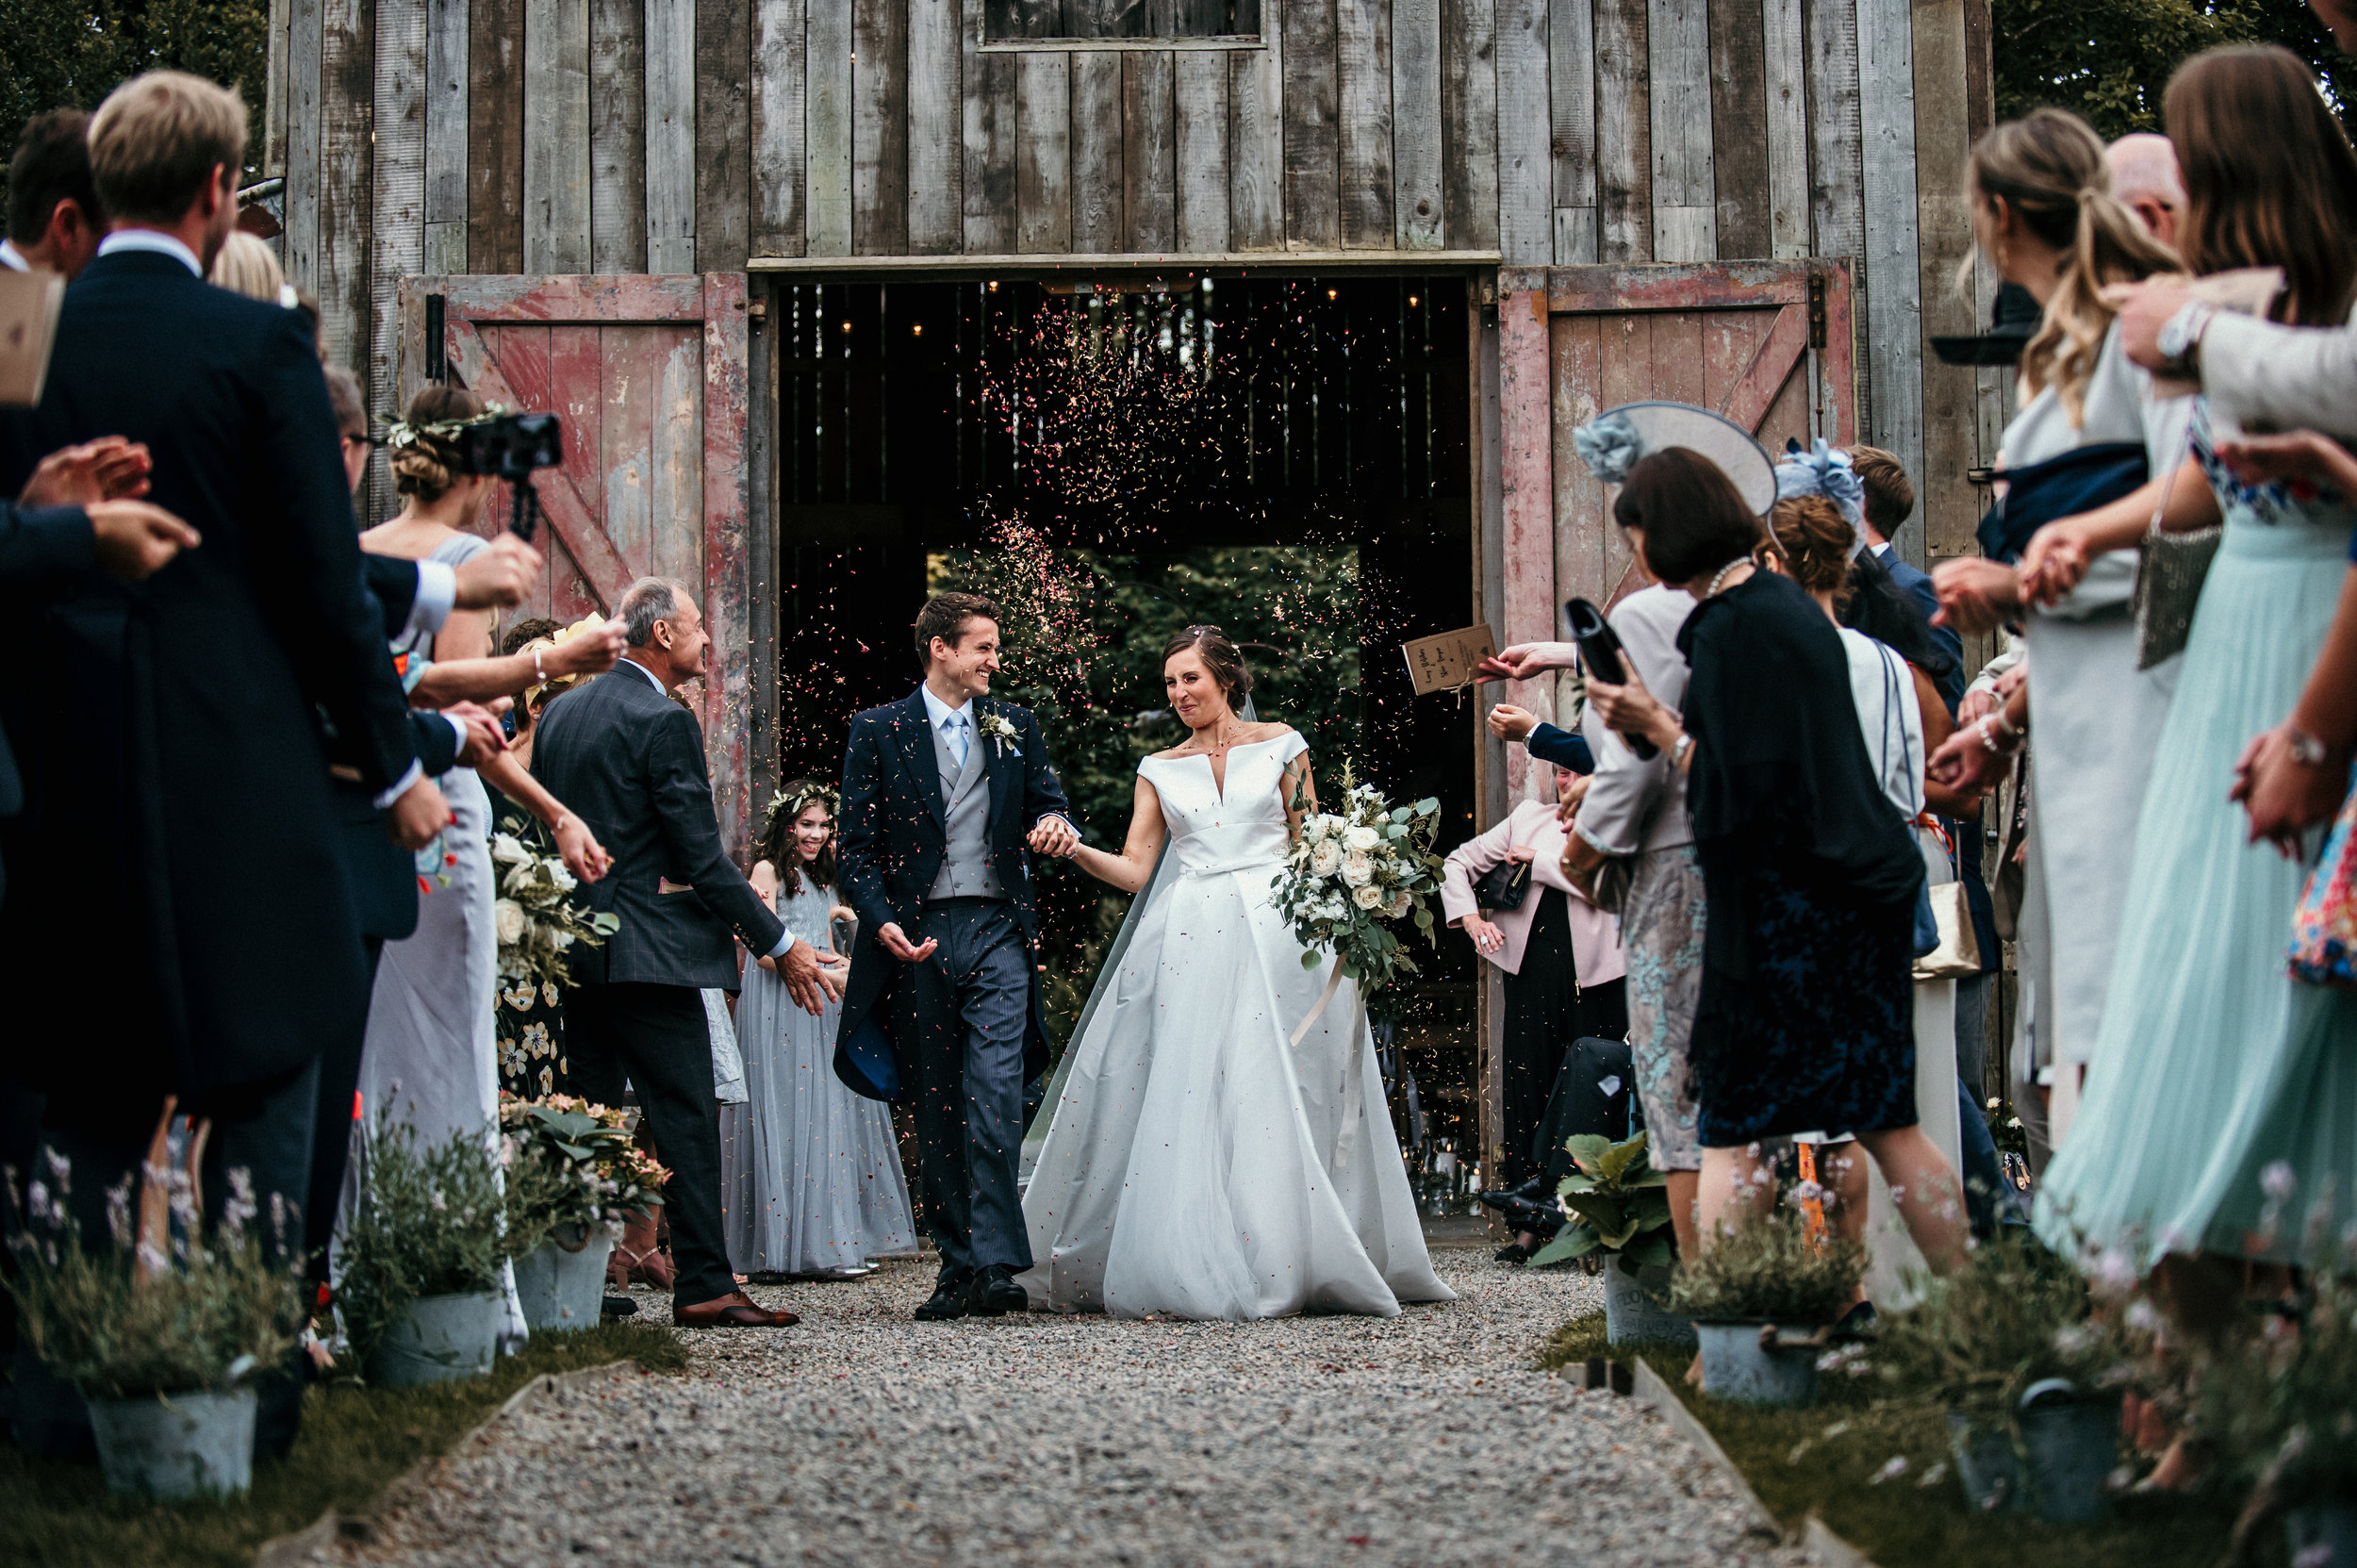 nancarrow-farm-wedding-photographer-cornwall-19.jpg